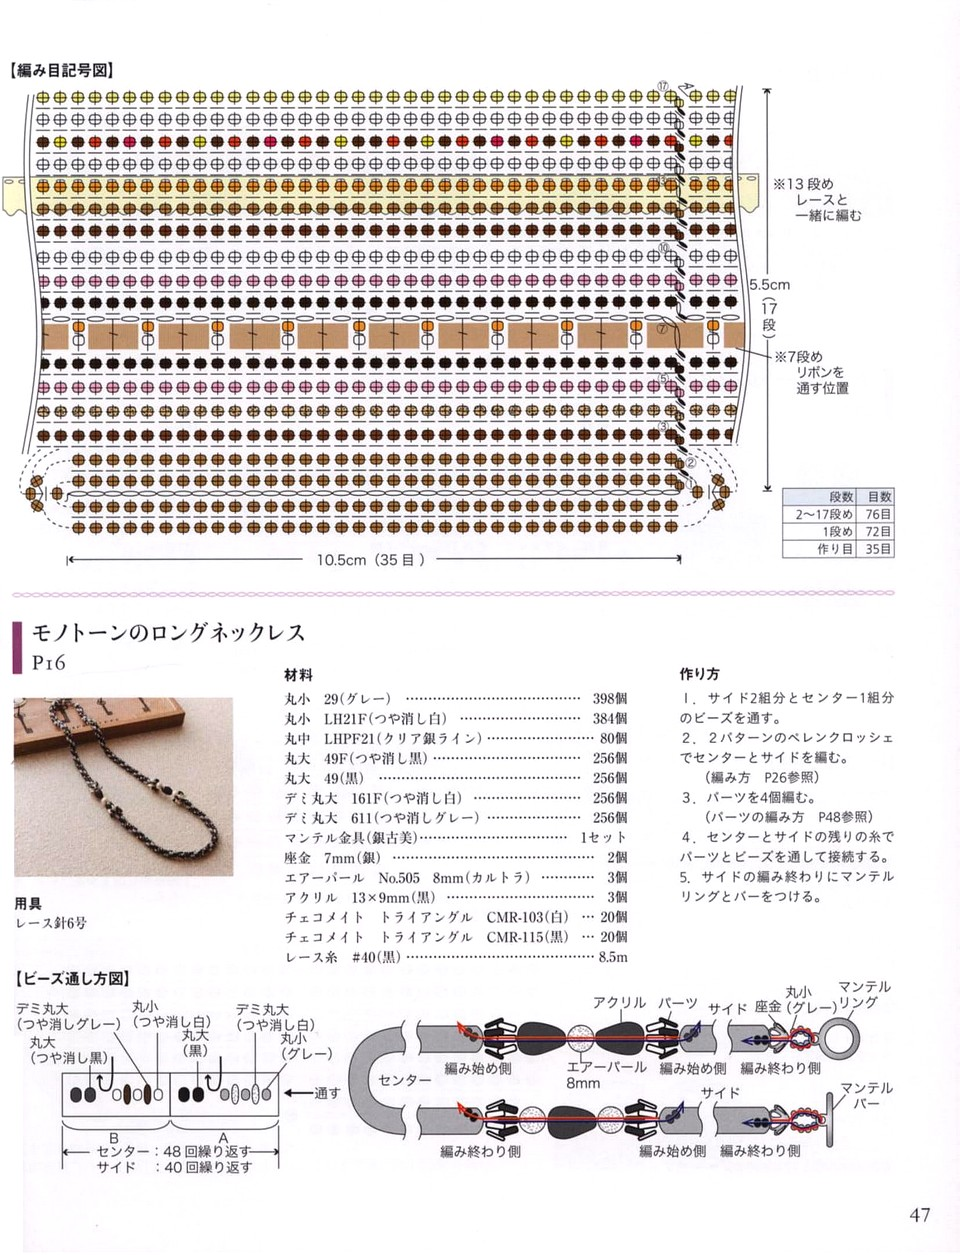 717 Beads Crochet 17-48